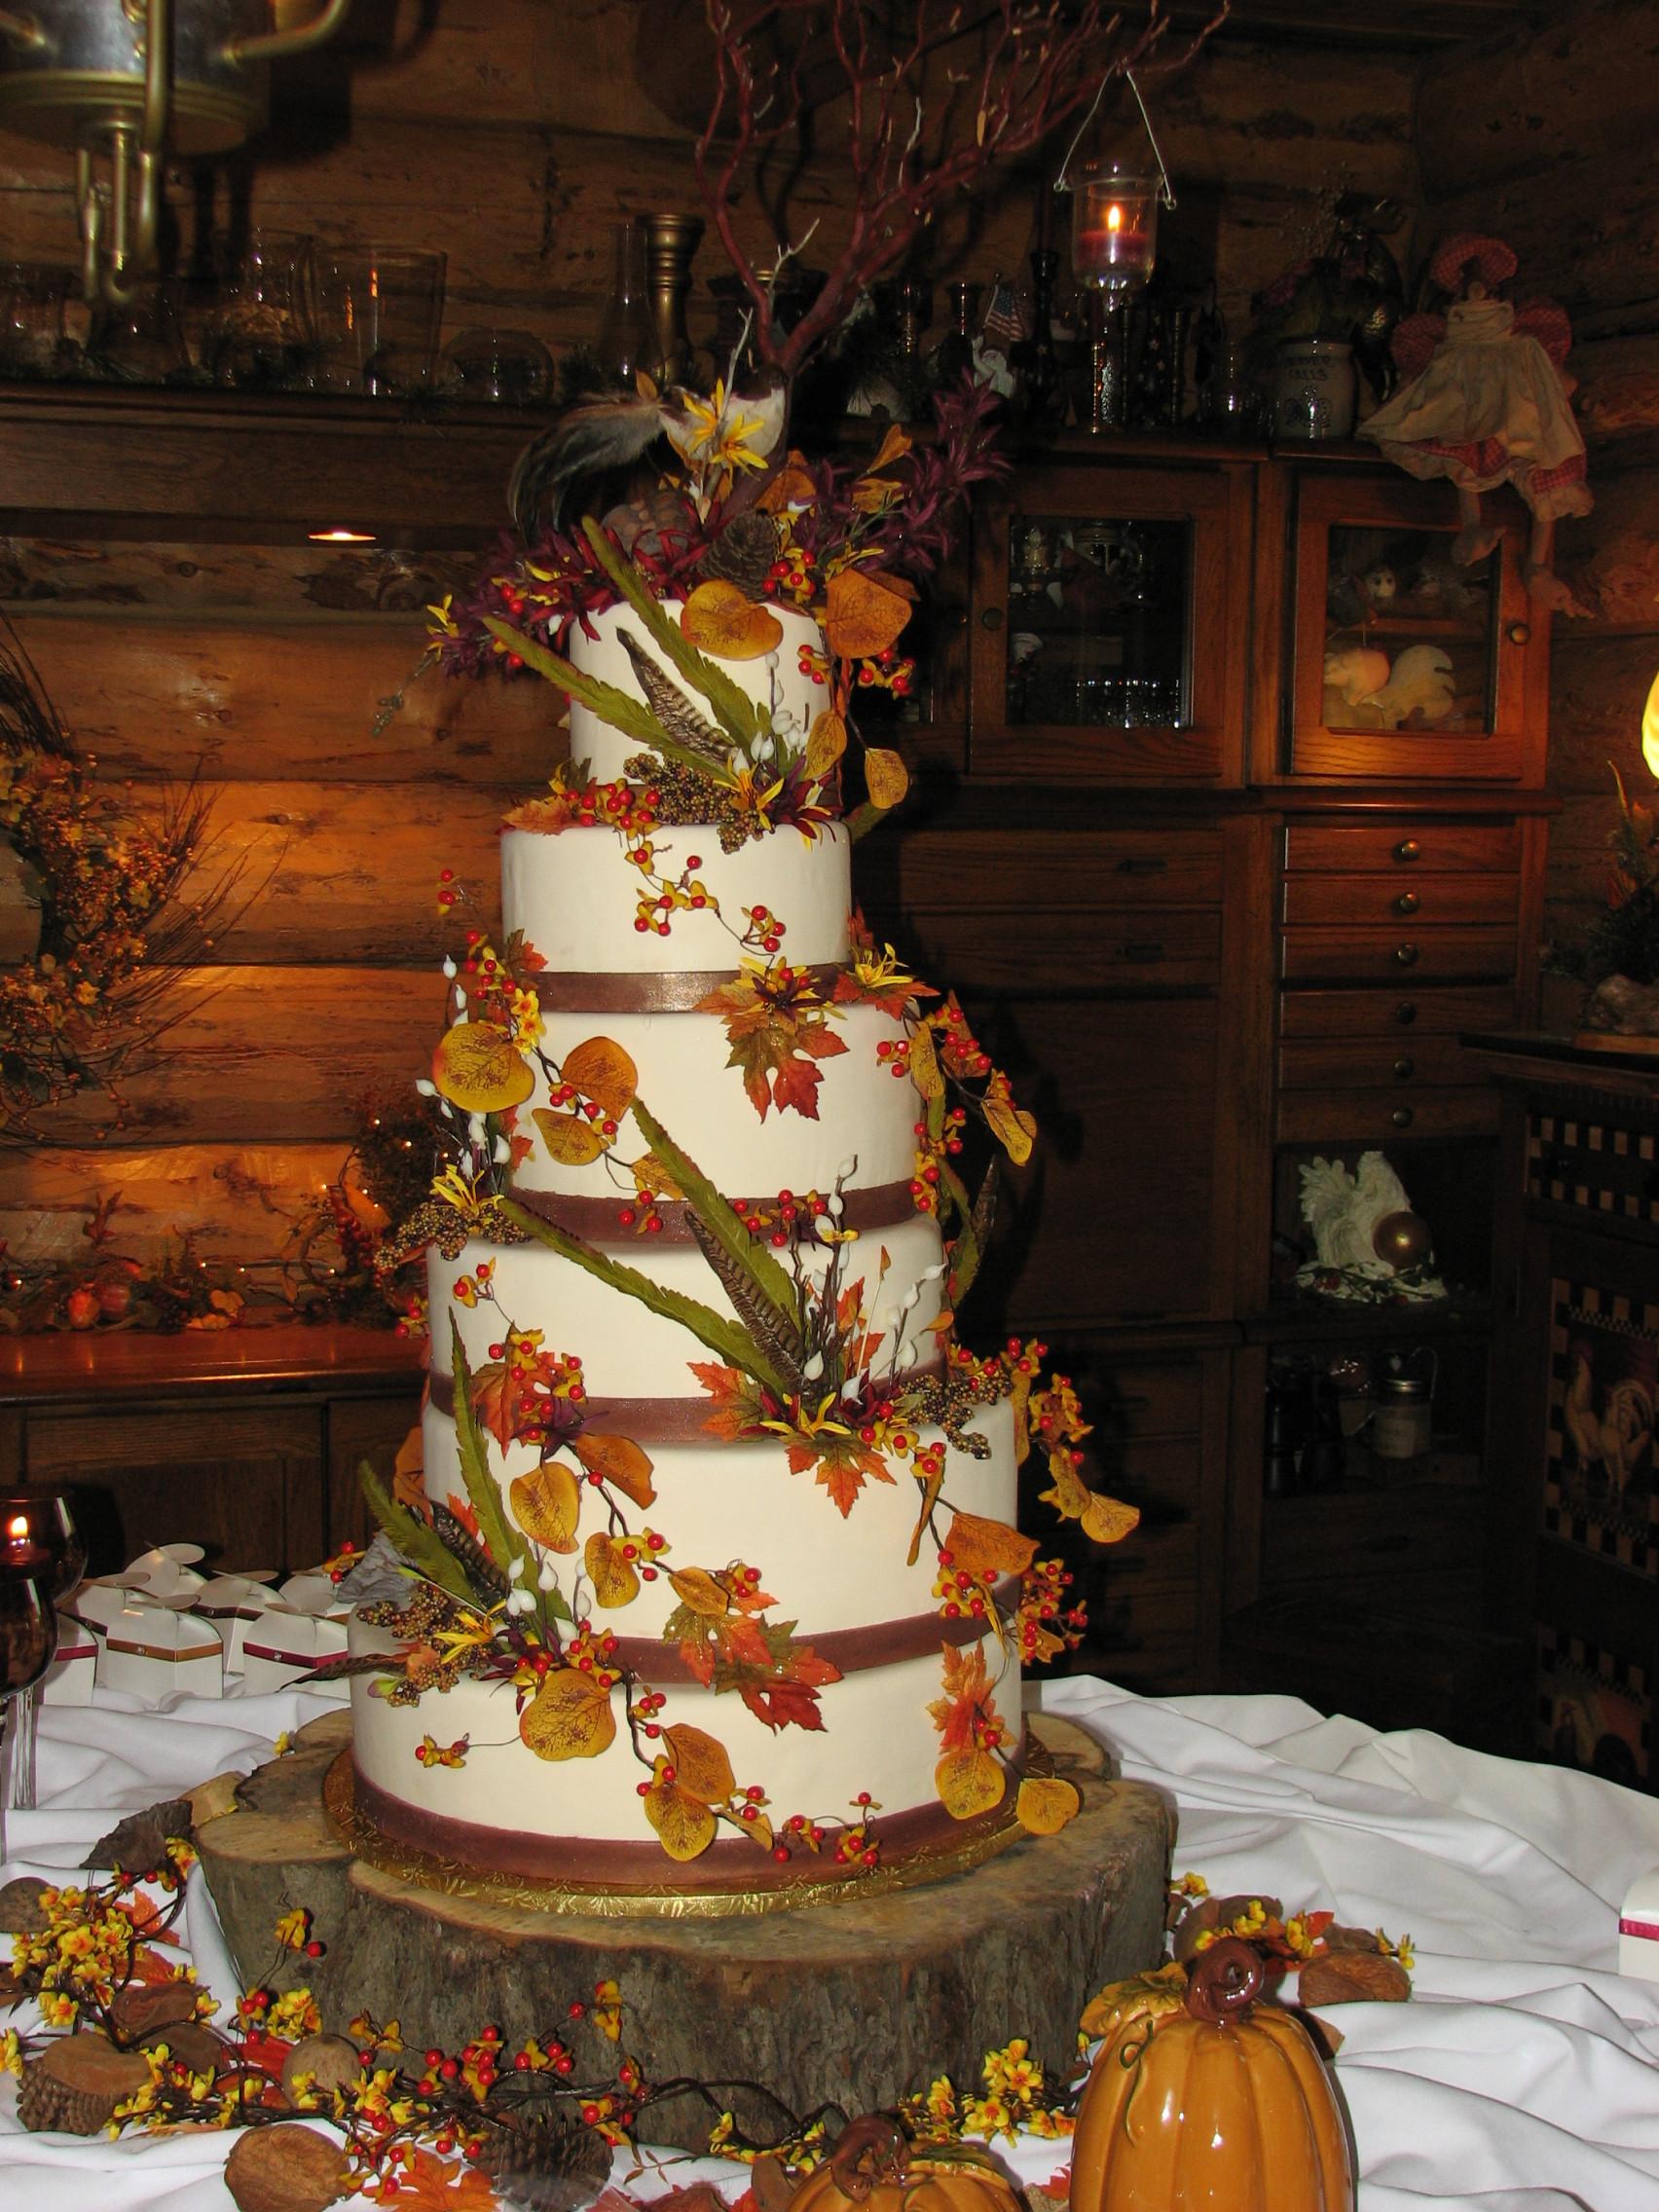 Fall Themed Wedding Cakes  Fall theme wedding cakes idea in 2017